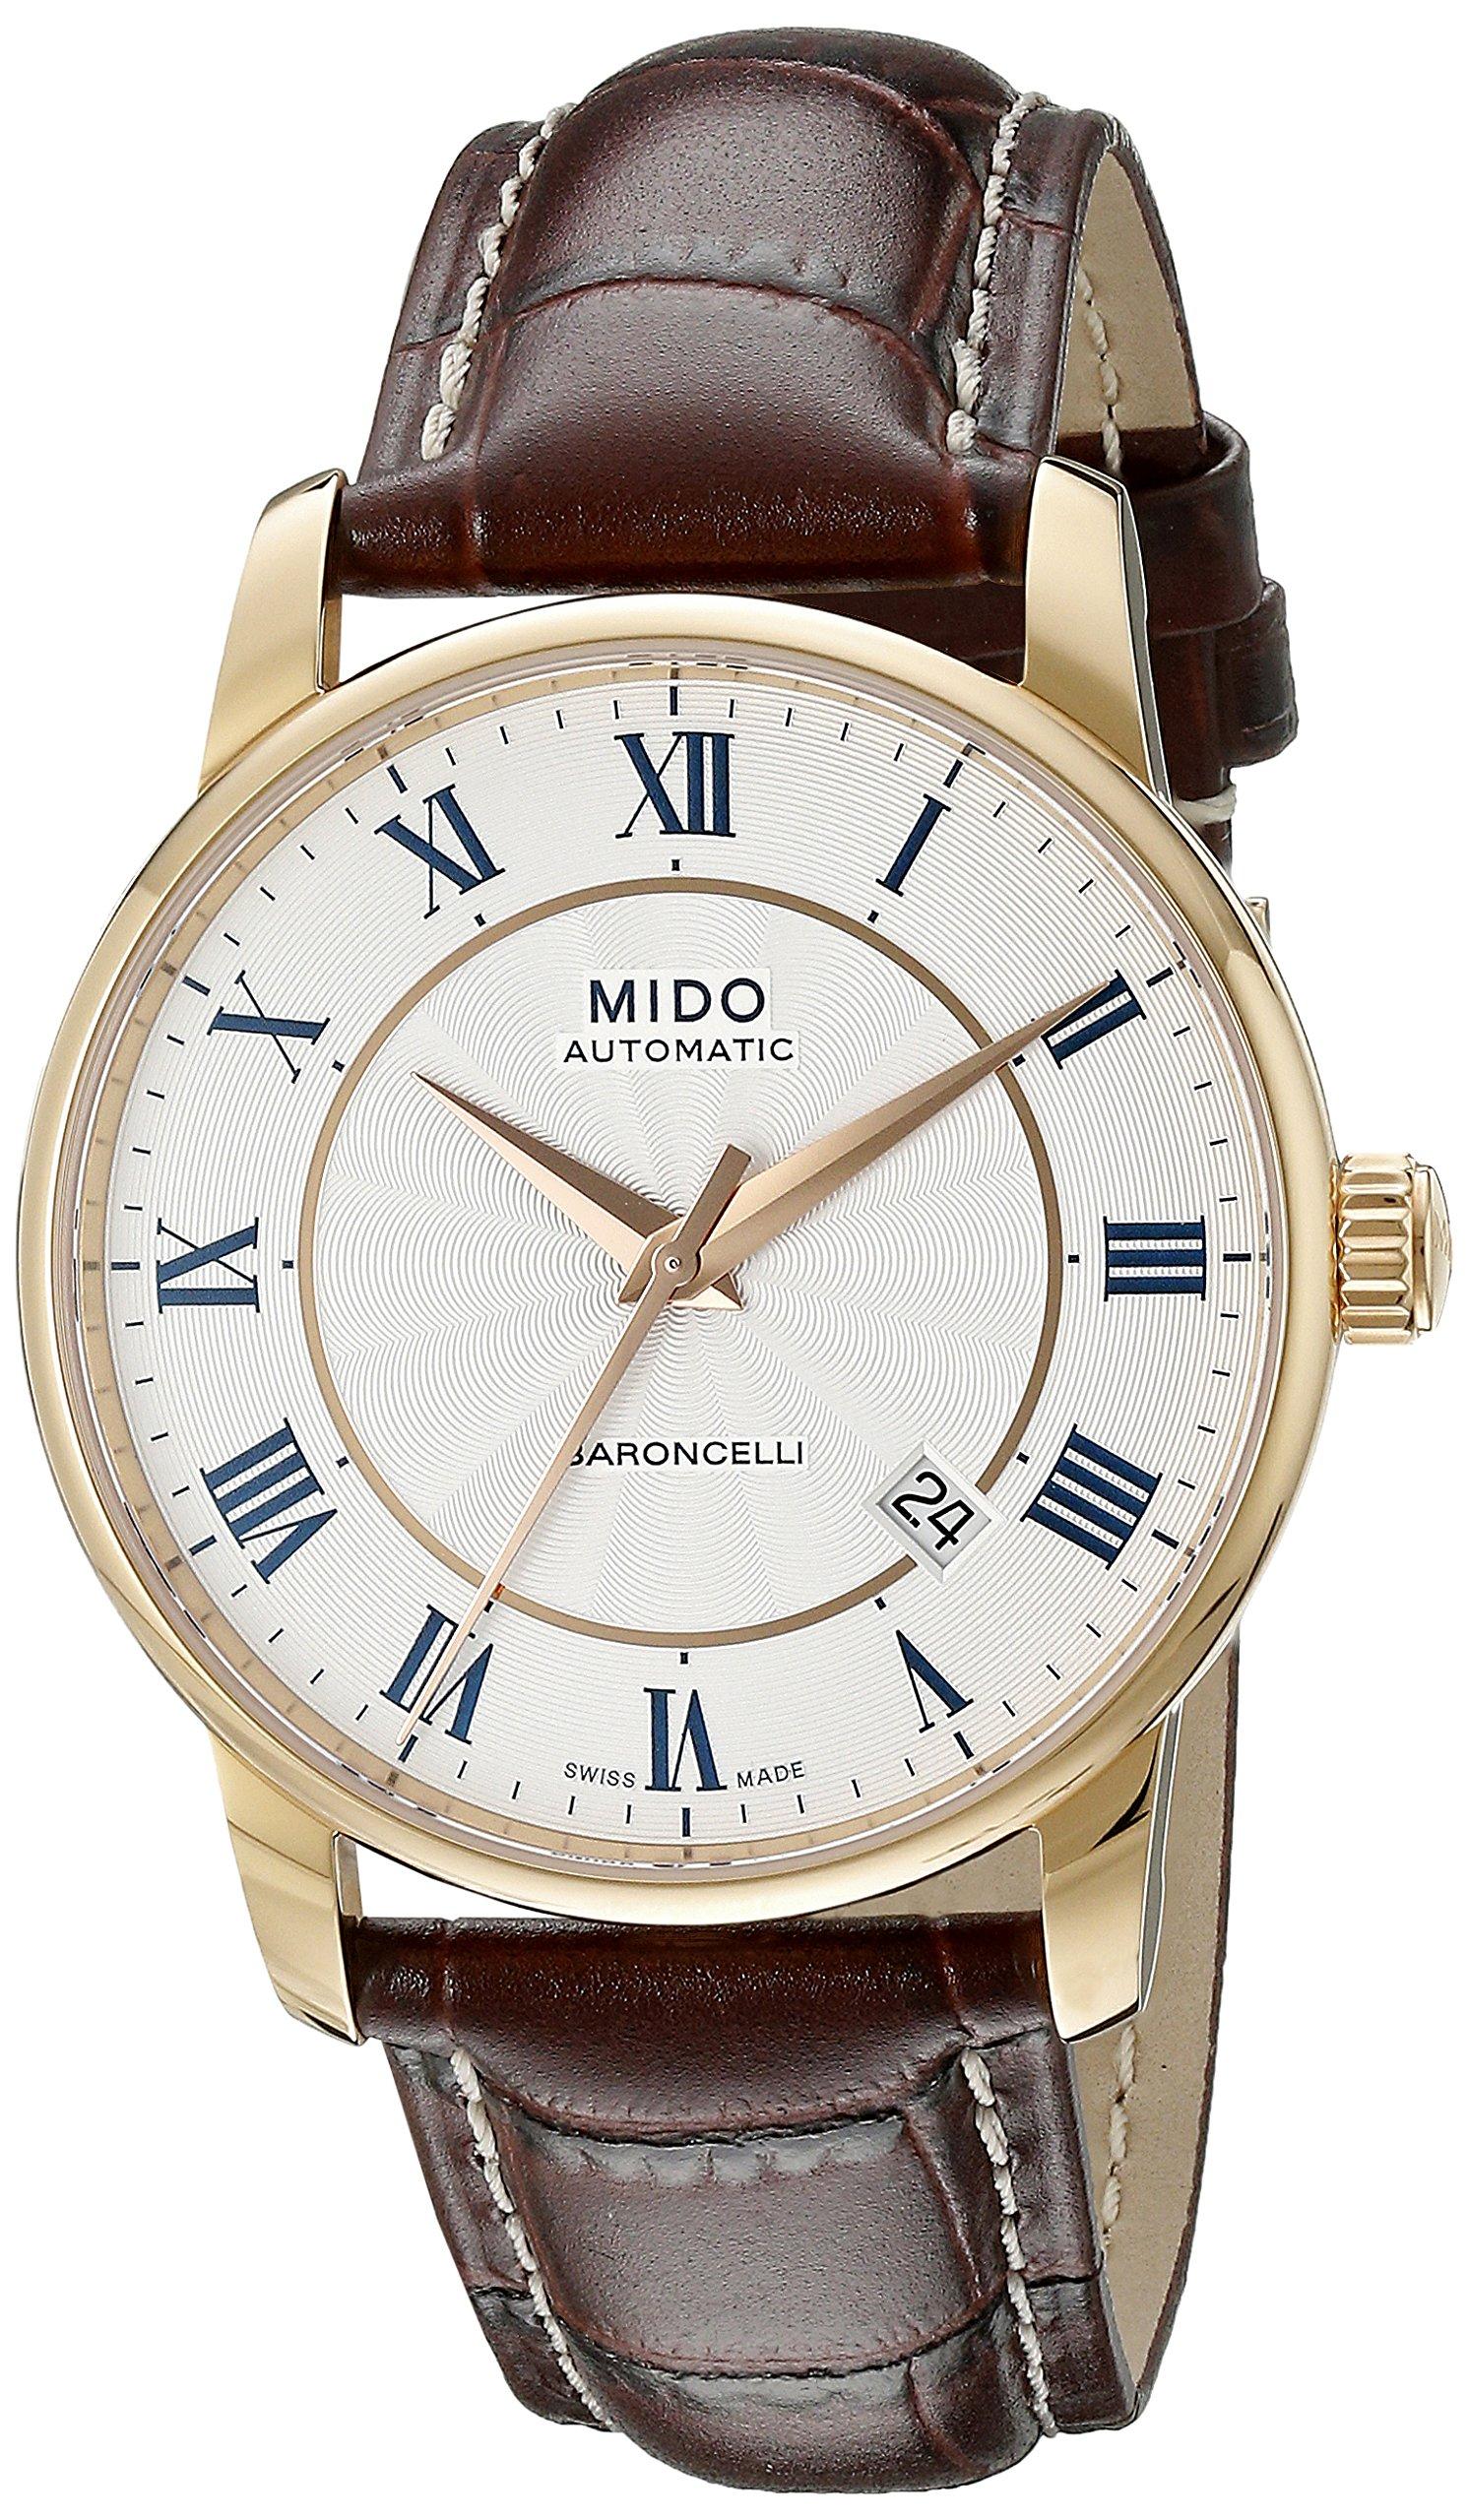 Mido-Herren-Armbanduhr-XL-Baroncelli-Analog-Automatik-Leder-M86002218